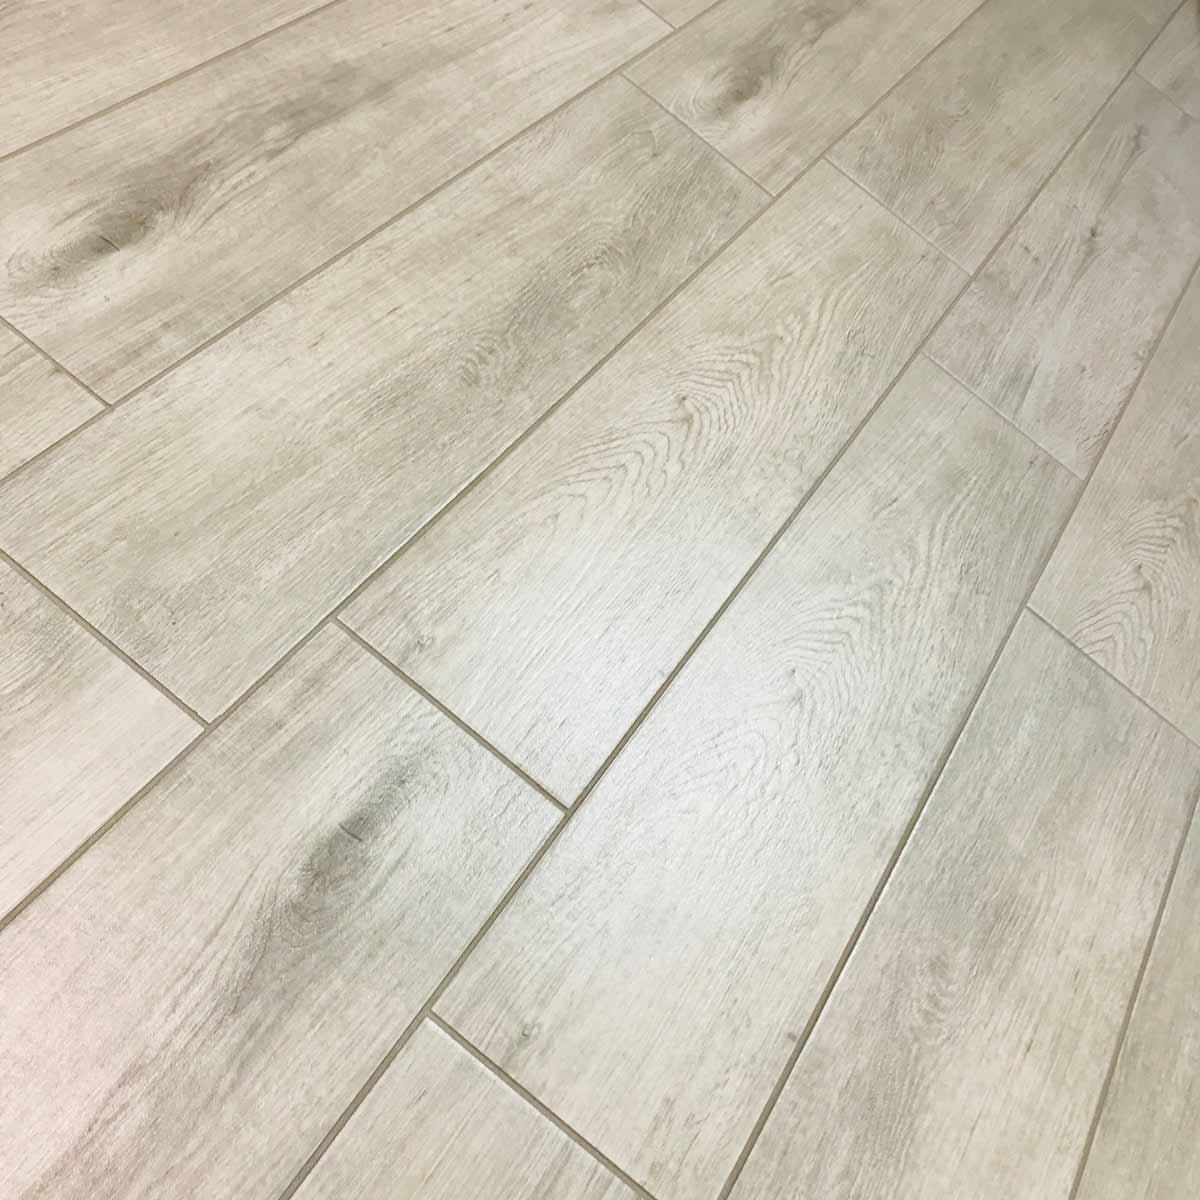 15 5x62cm scandinavia soft grey wood plank tile